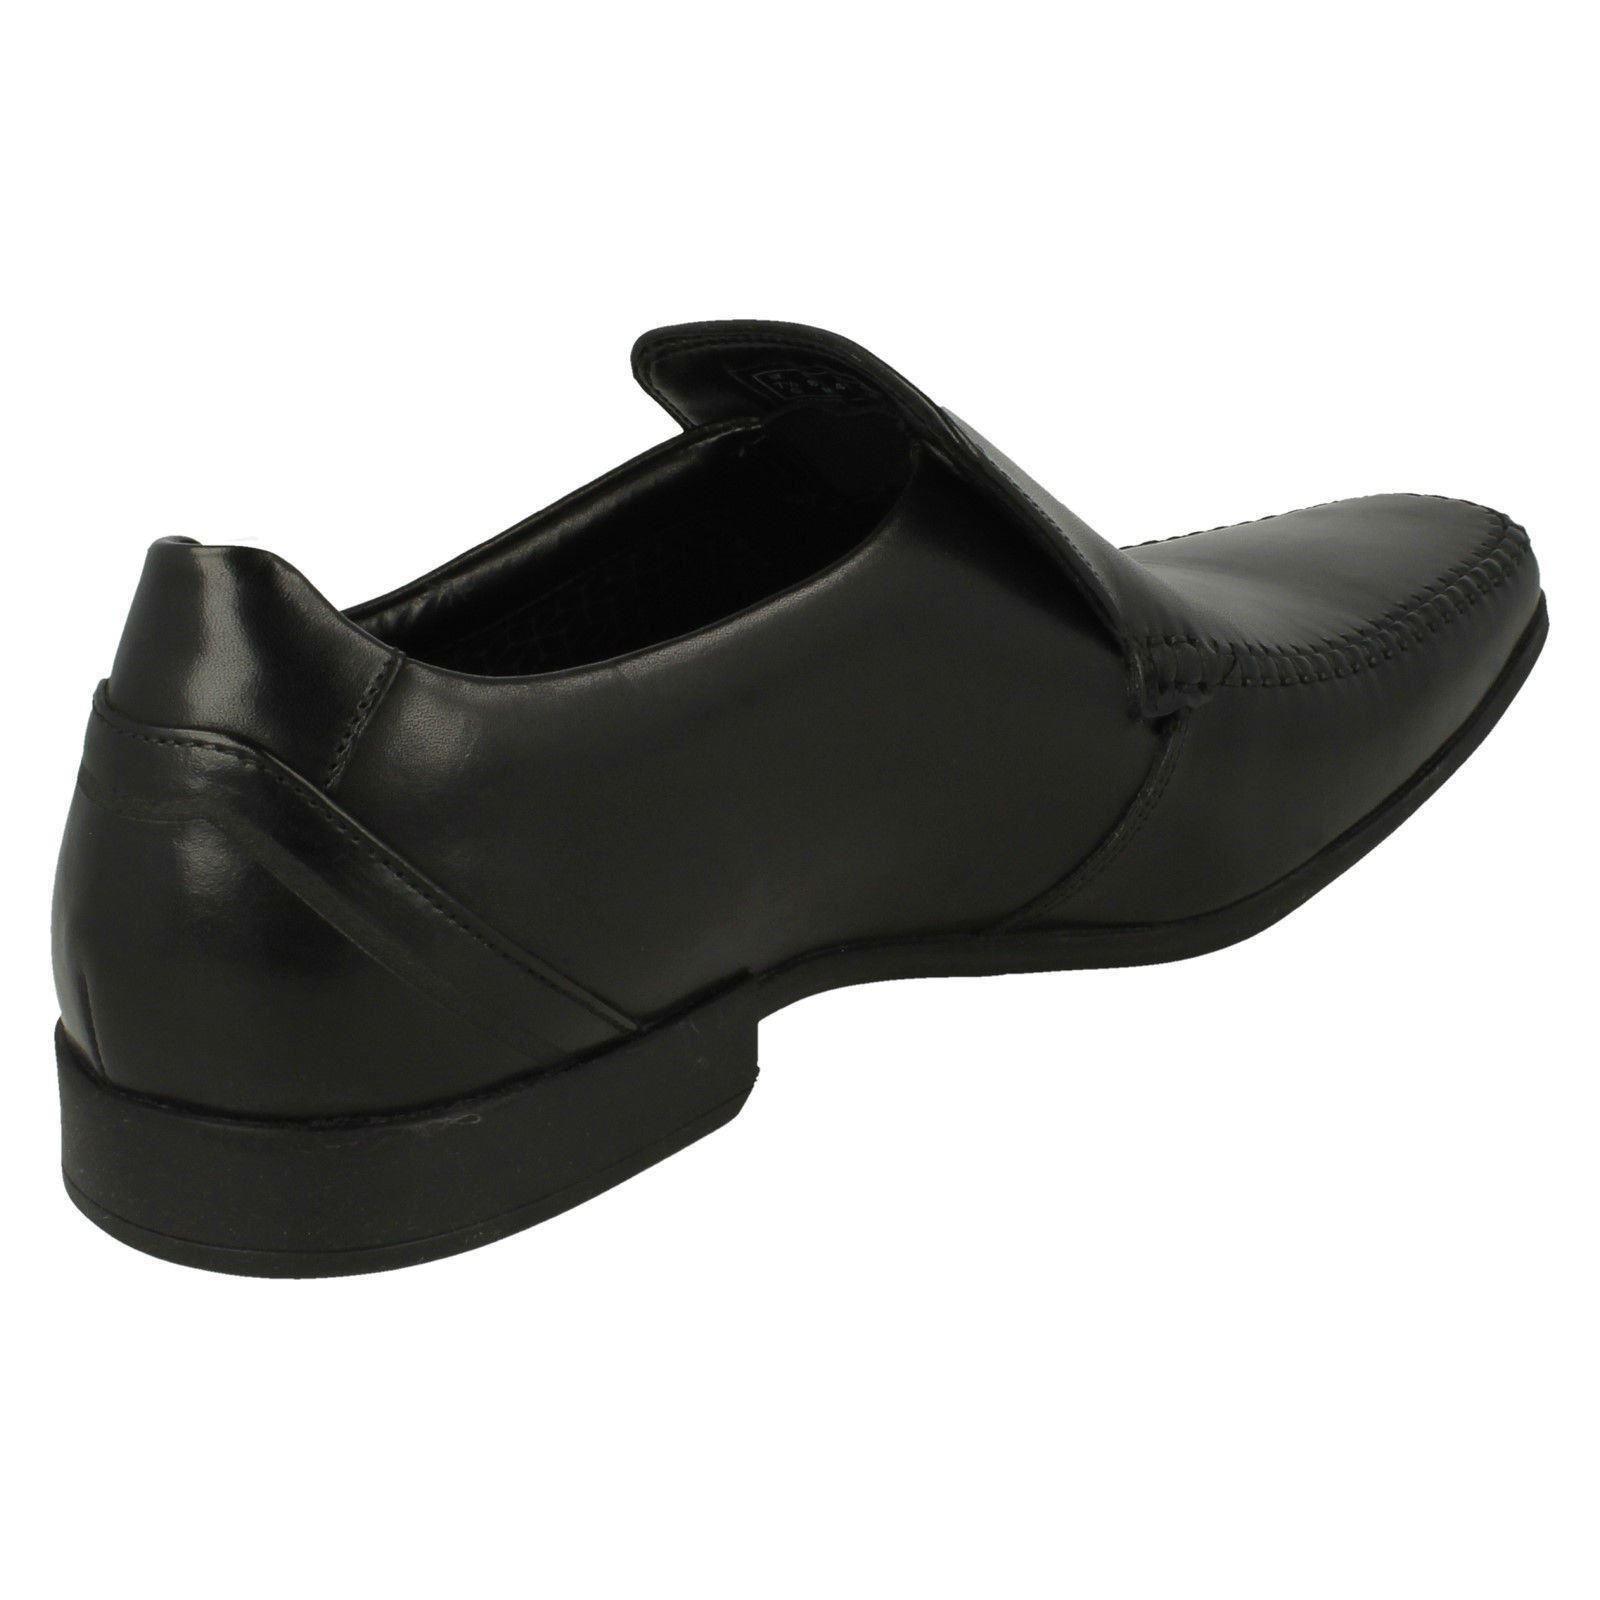 Clarks On  Uomo Formal Slip On Clarks Schuhes 'Glement Seam' 8c5899